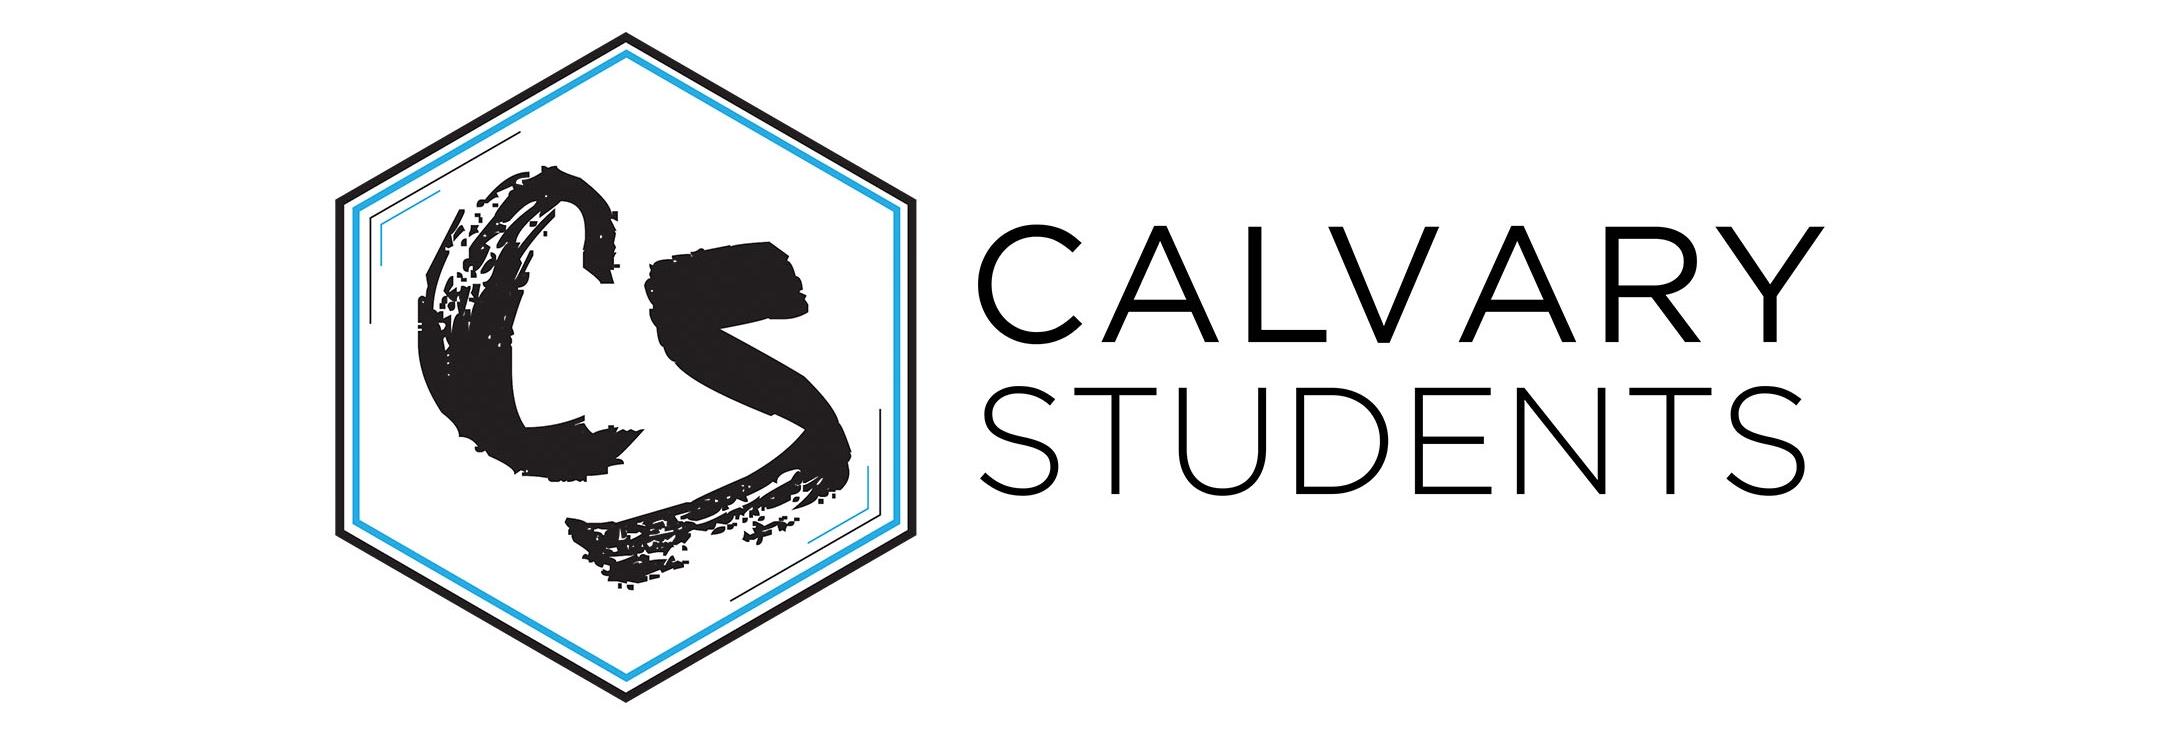 Calvary Students Banner.jpg